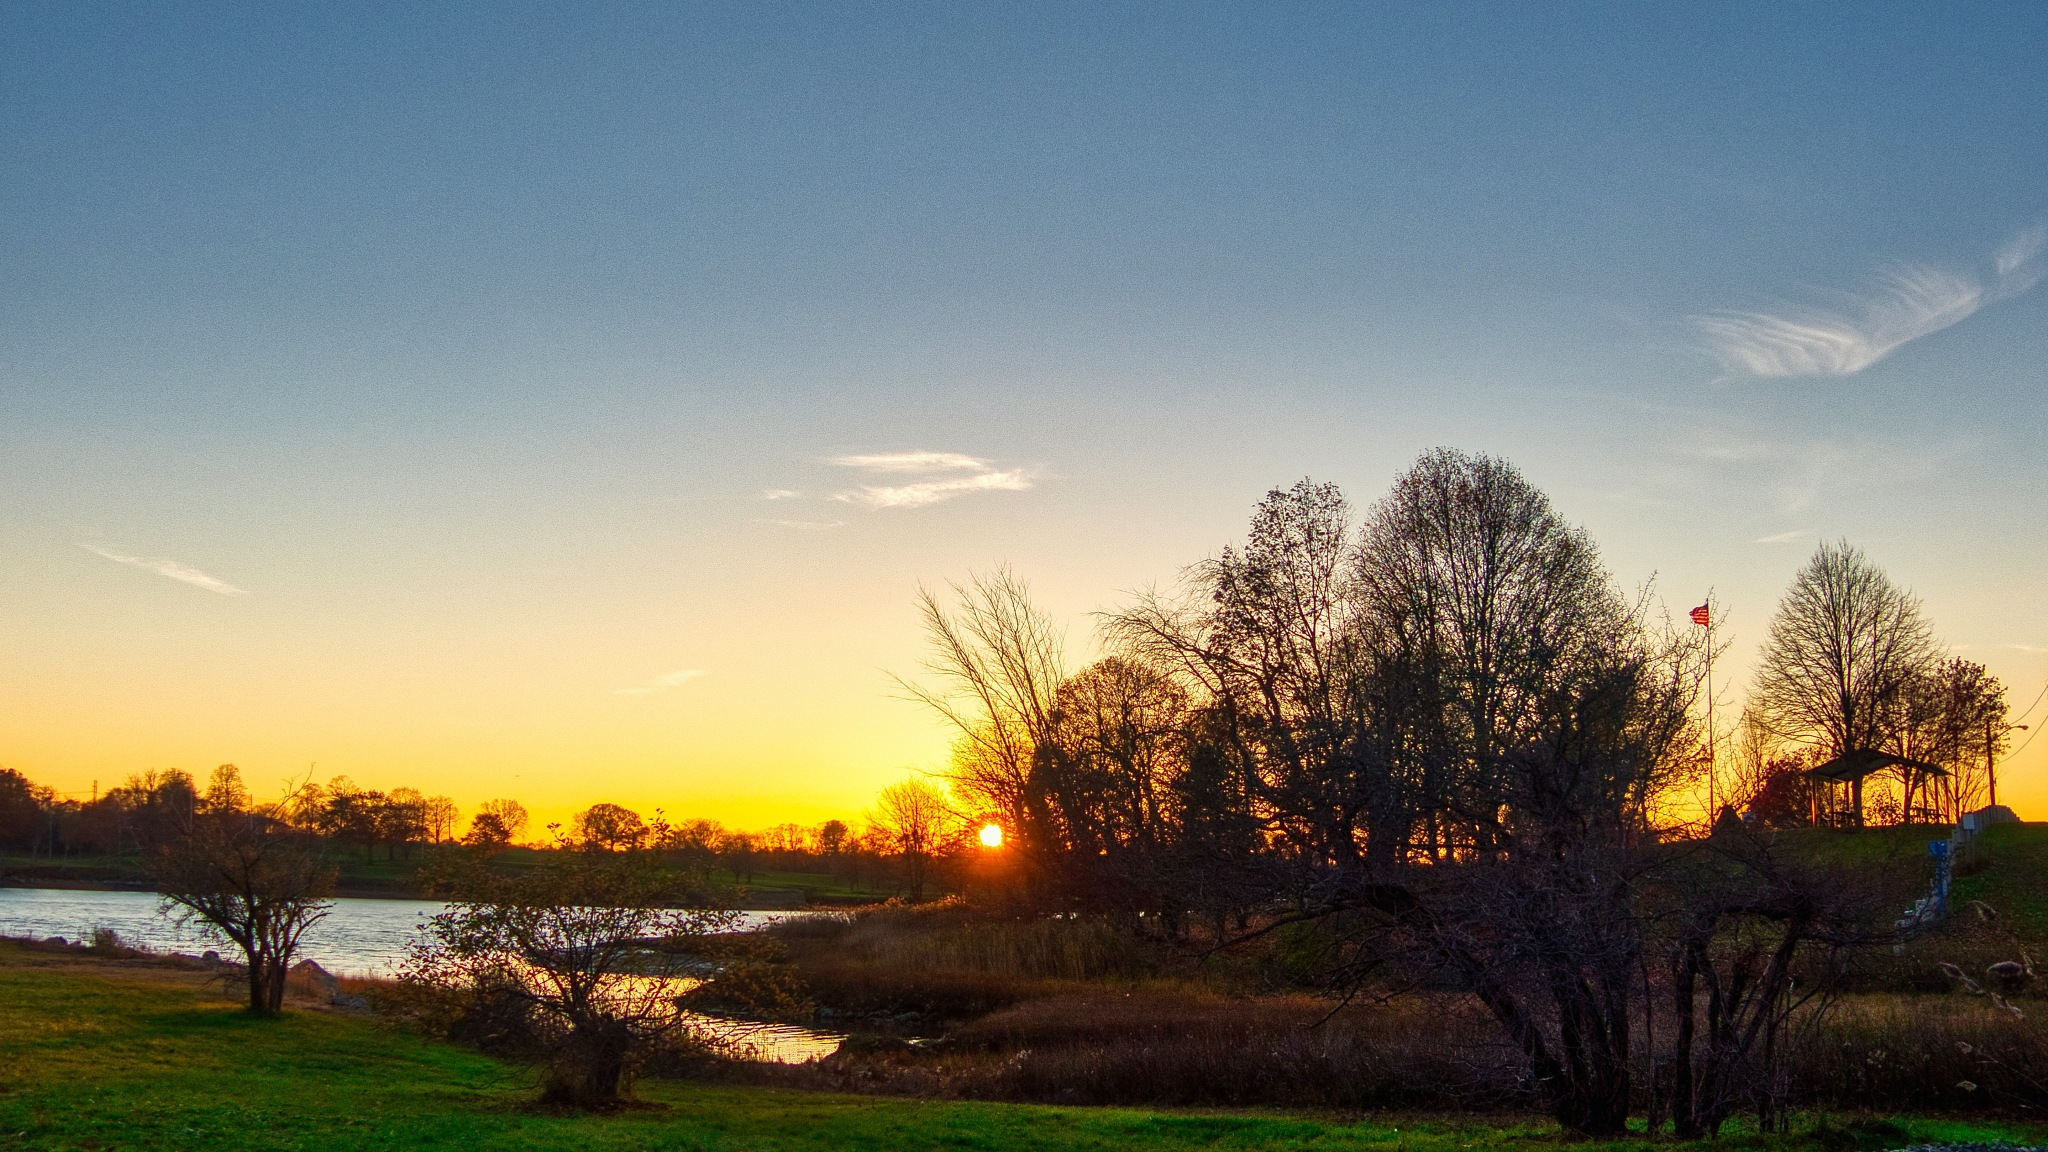 Obear Park at Sunset by D. Scott Hufford